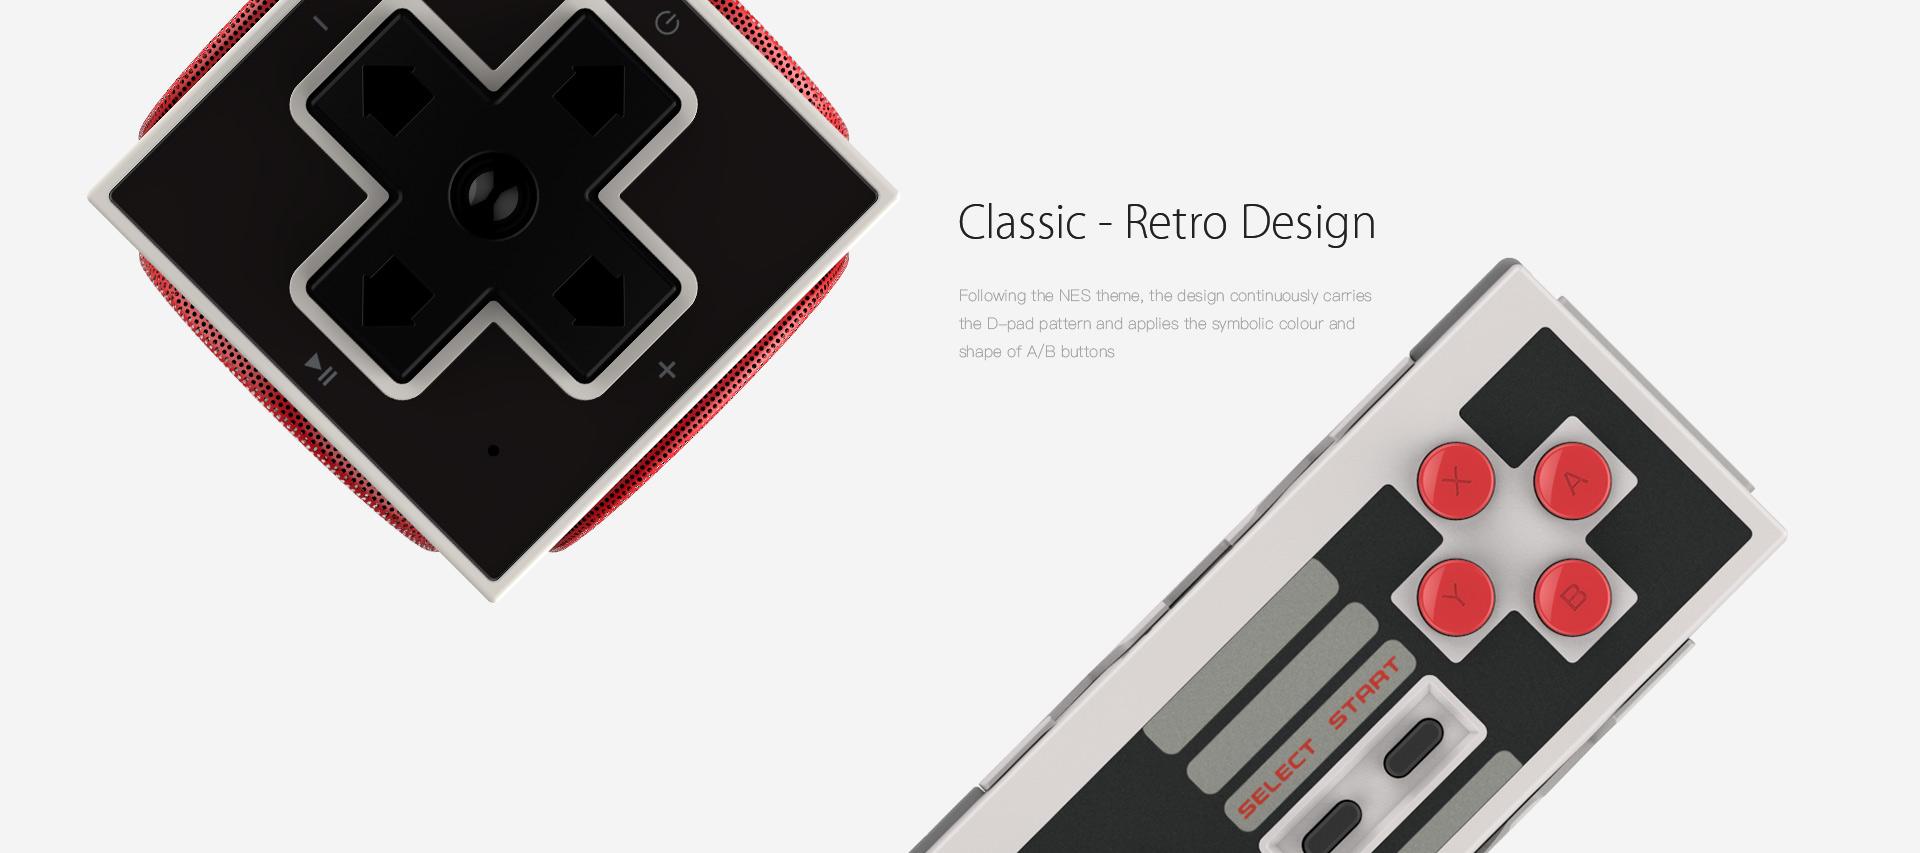 8Bitdo-Retro-Cube-Belchine-3